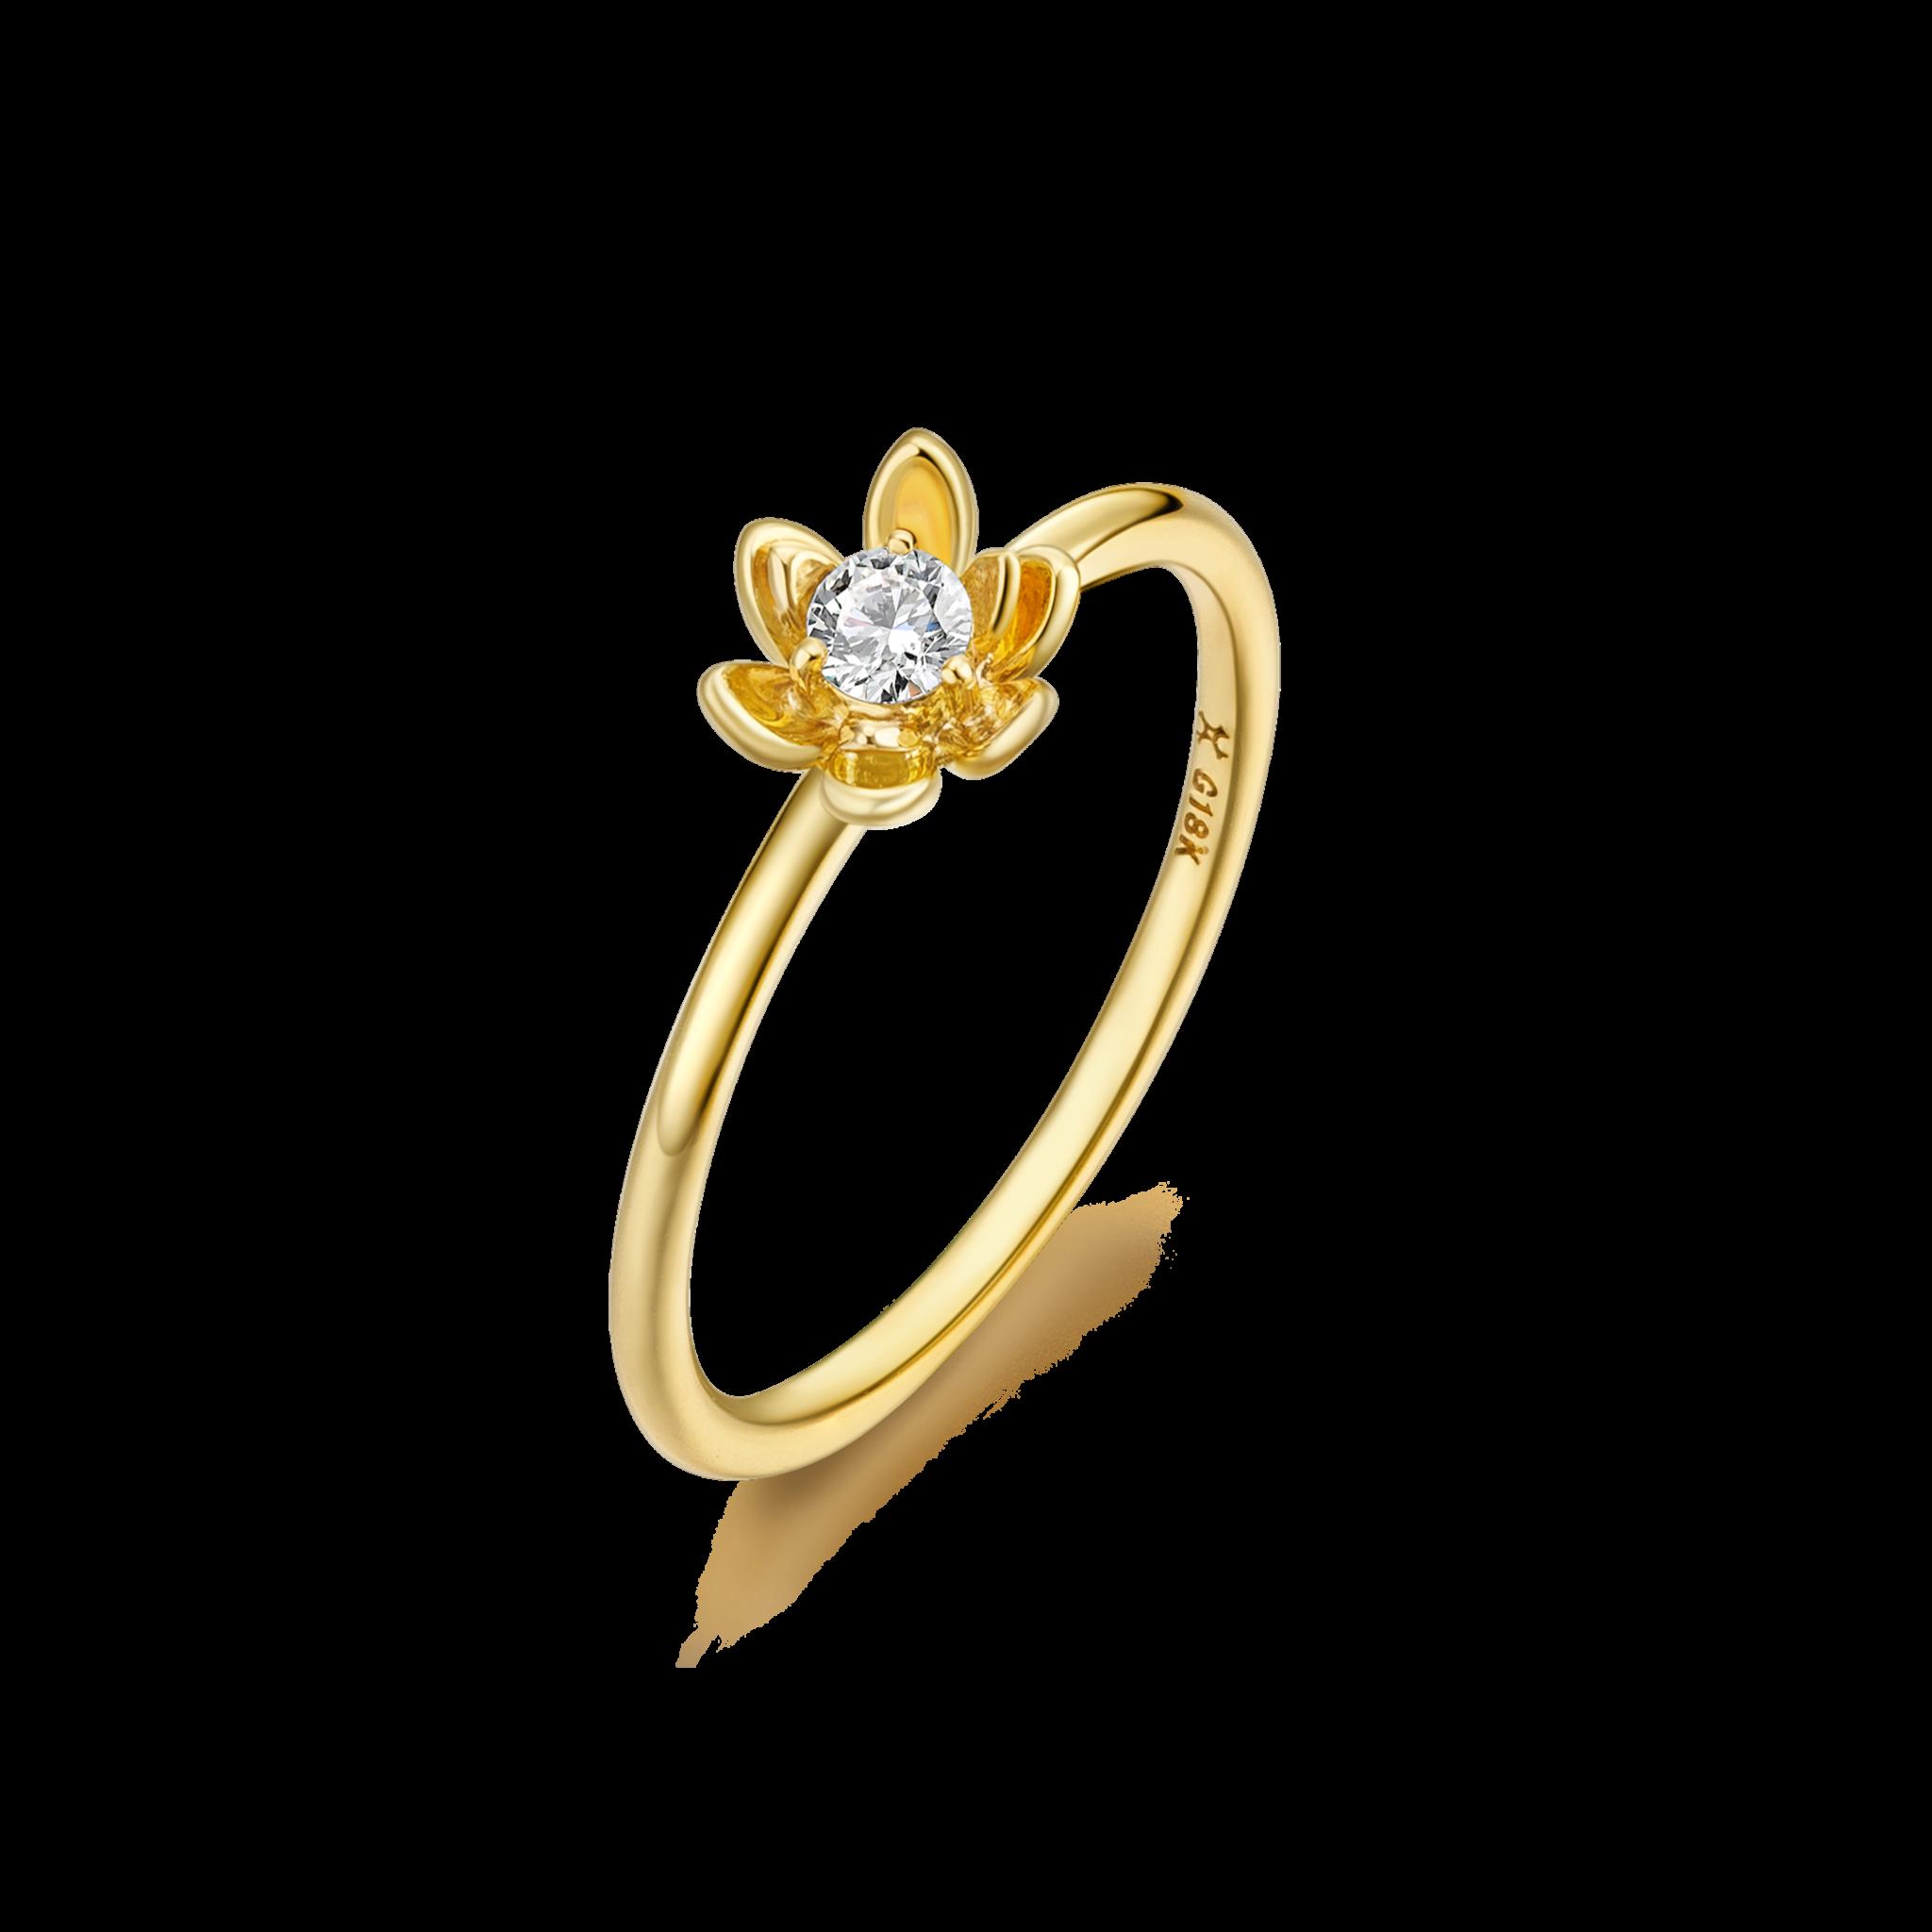 Magnolia Collection 18K黄金 钻石花瓣戒指 ¥5399